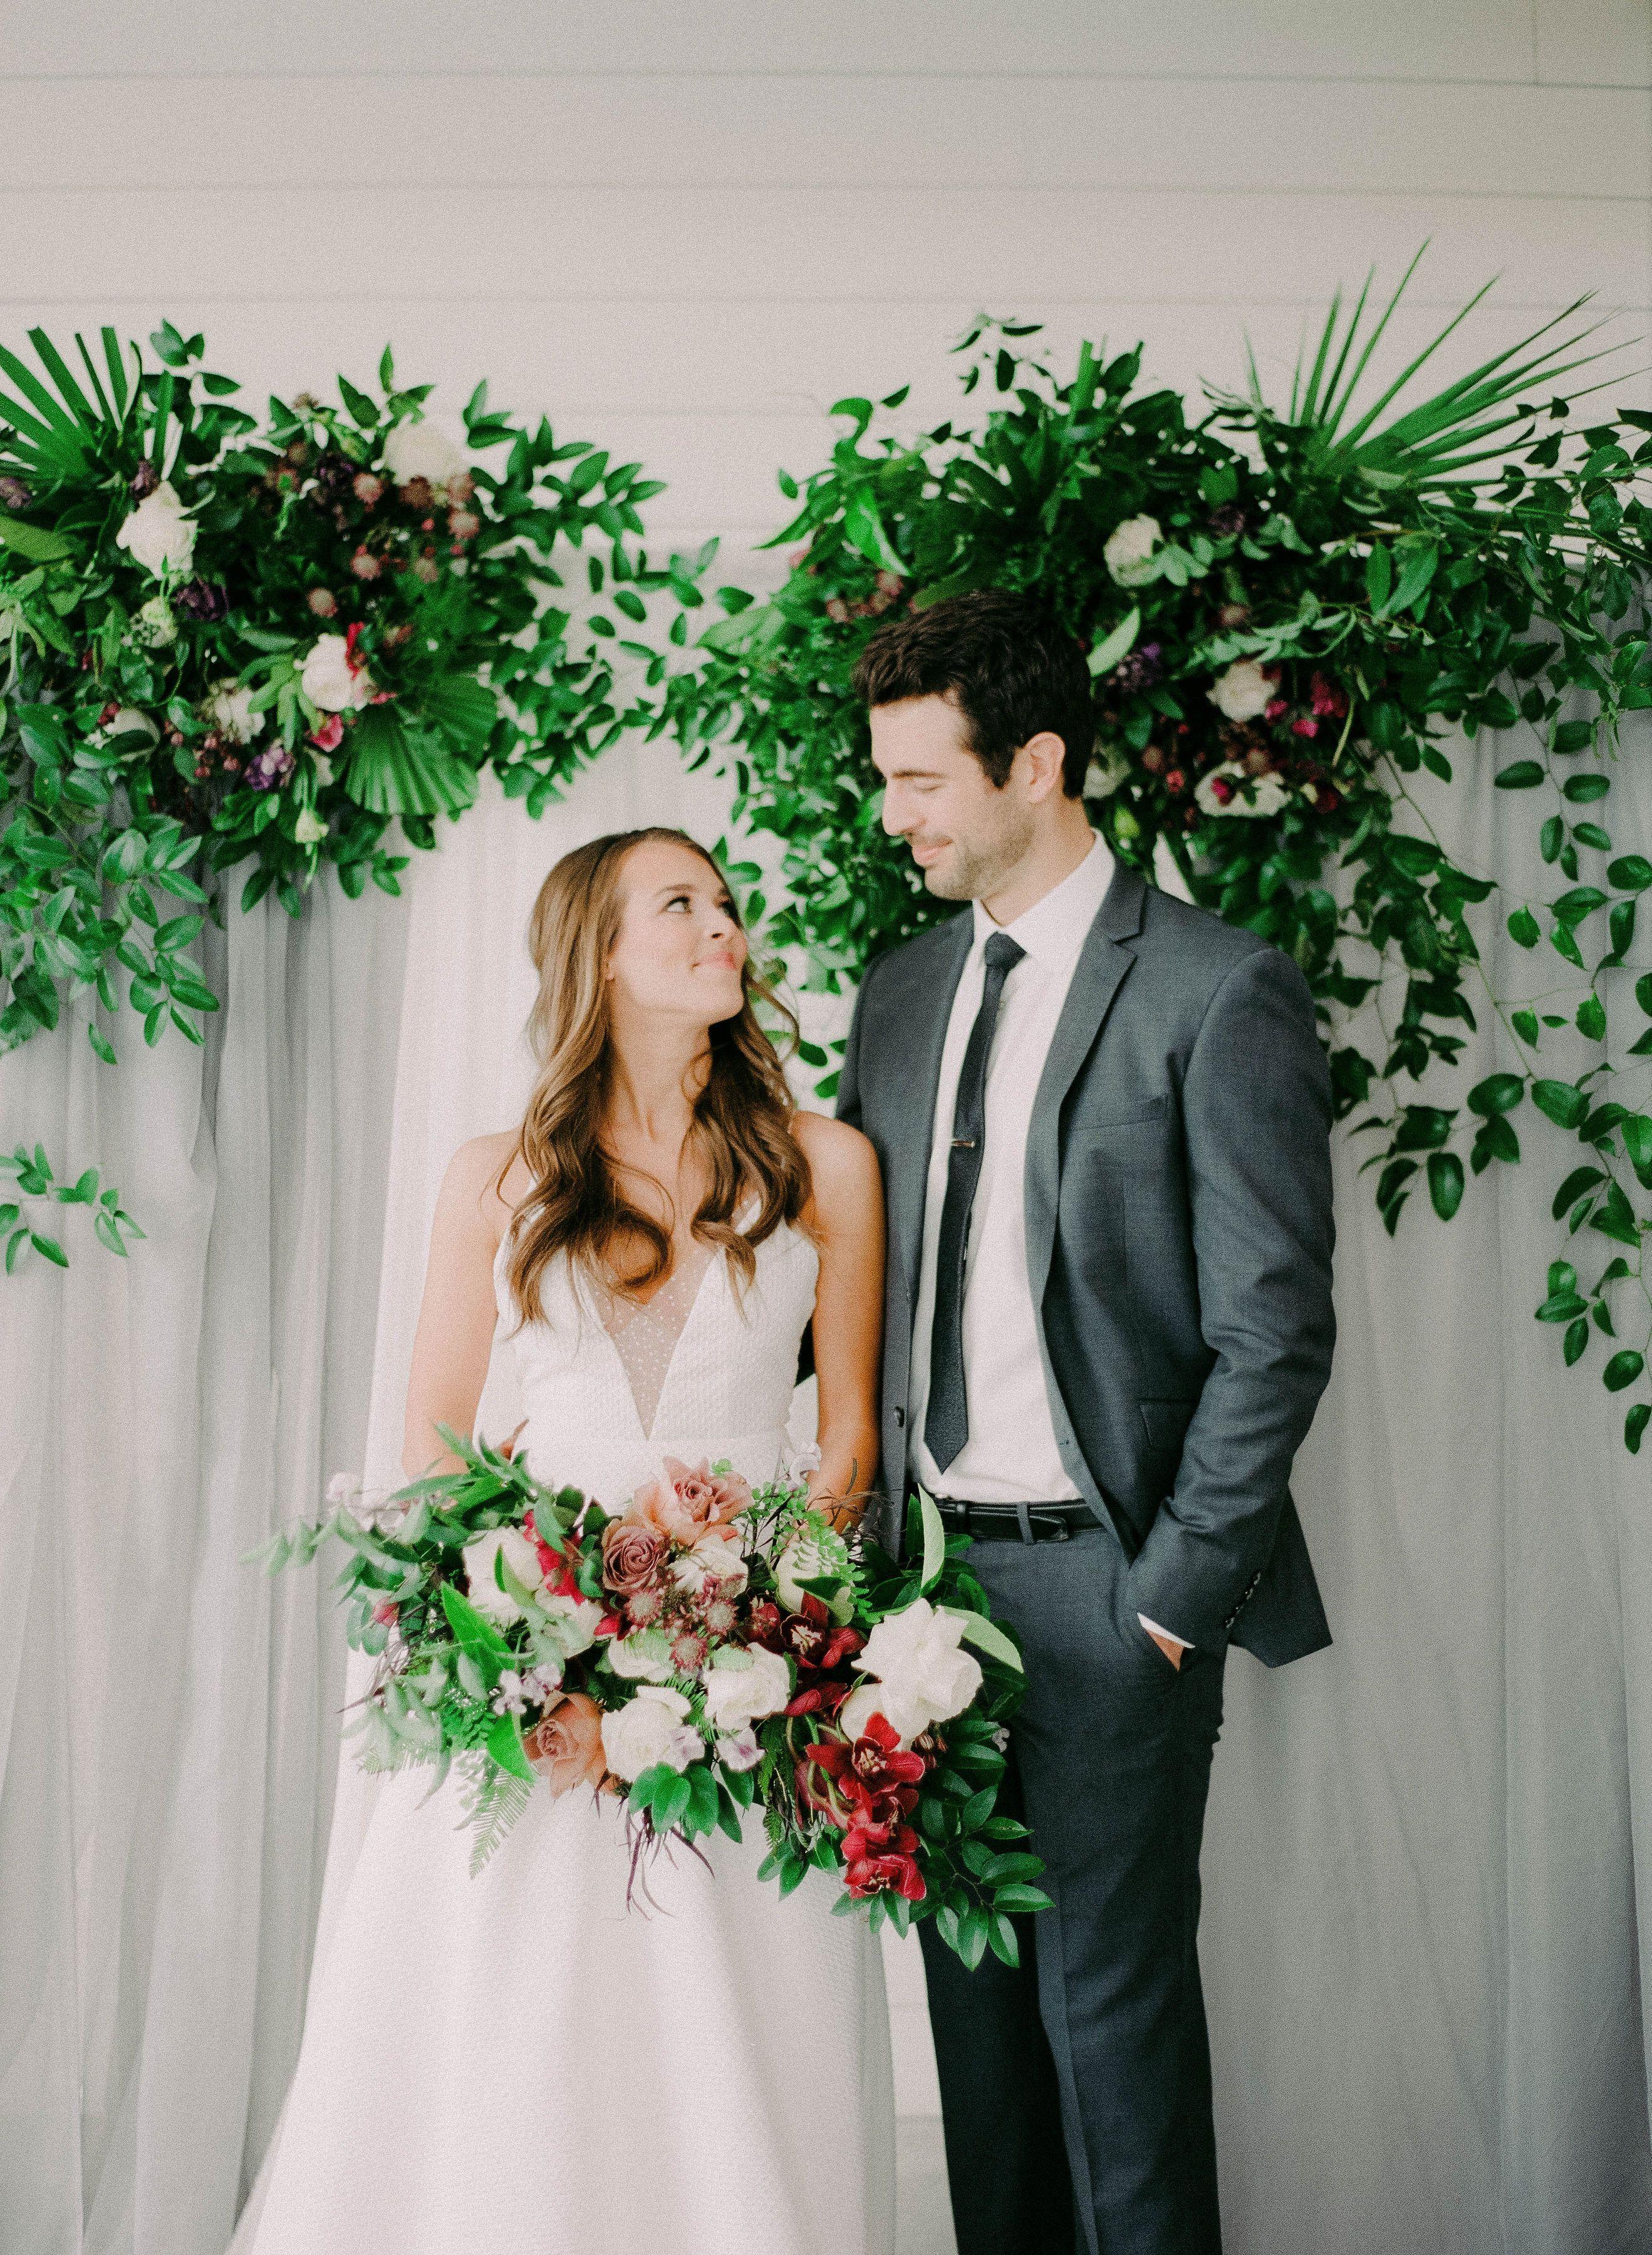 Photo Image Clairity Florals Roses Mint Venue Anew Dress The Bridal Parlour Stlouisweddingflorist Weddingflor In 2020 Wedding Florist Wedding Fine Art Wedding